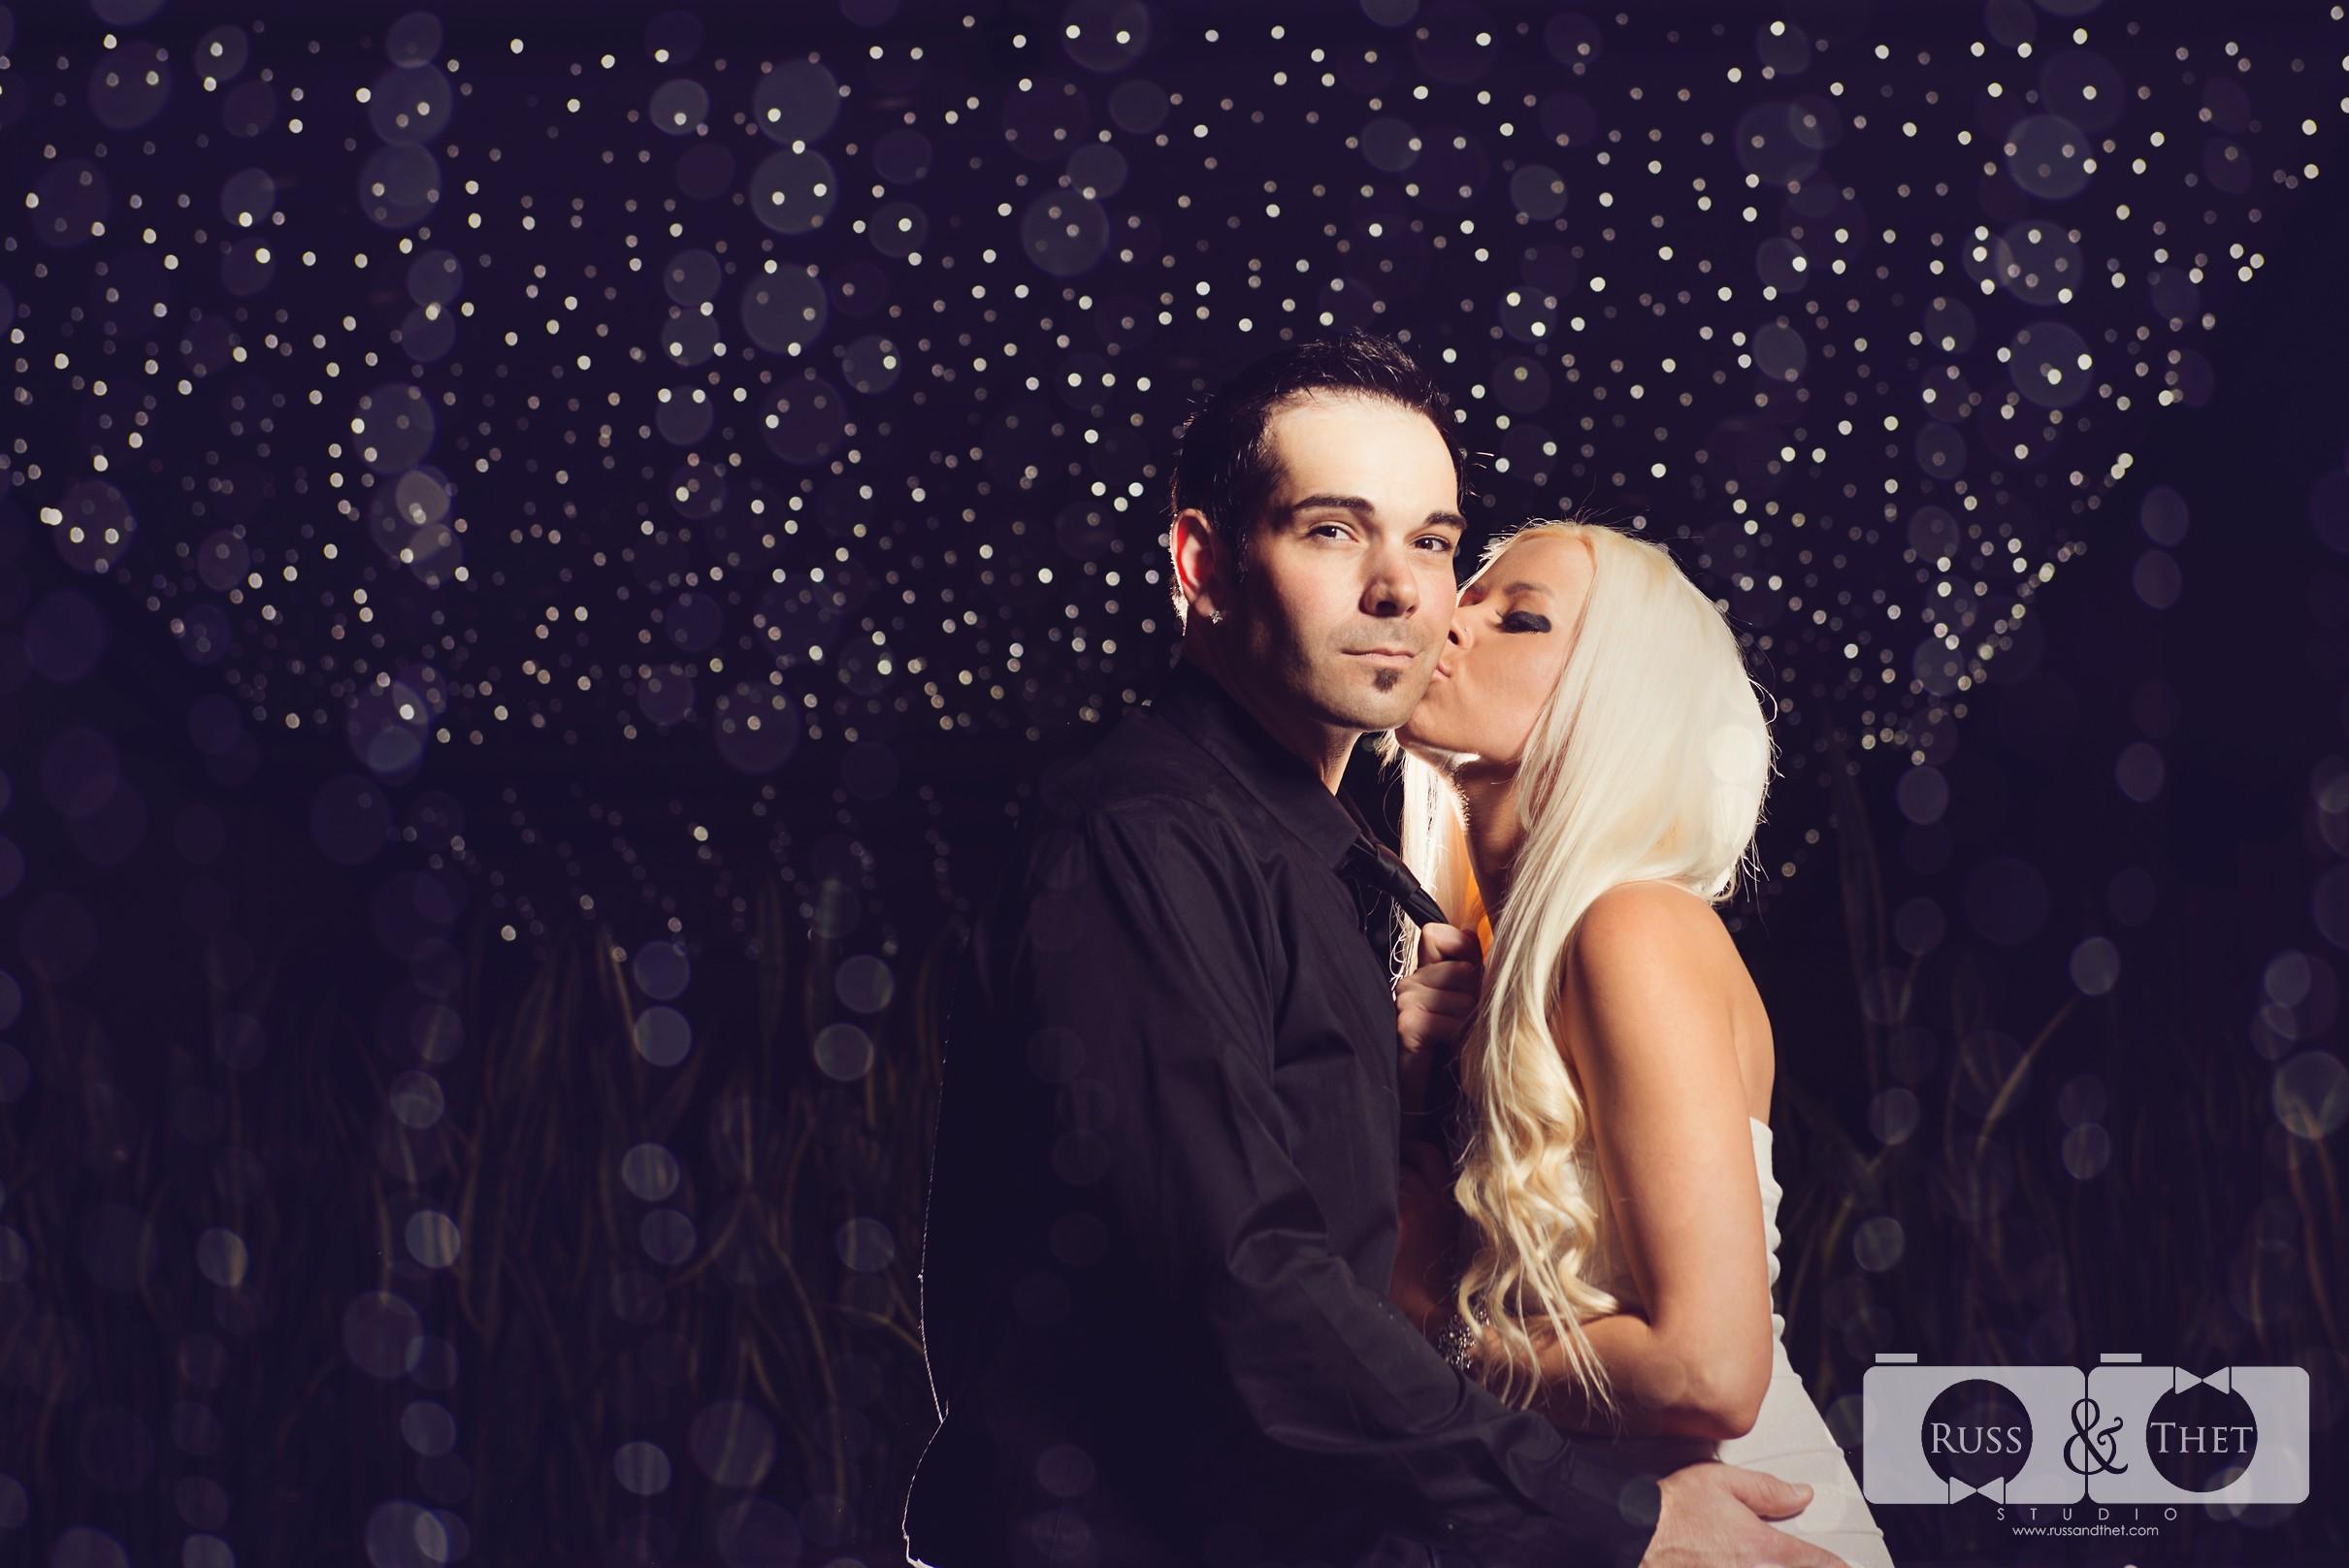 Jon&Kimee-The-Hills-Hotel-Engagement-Photographer (40).jpg